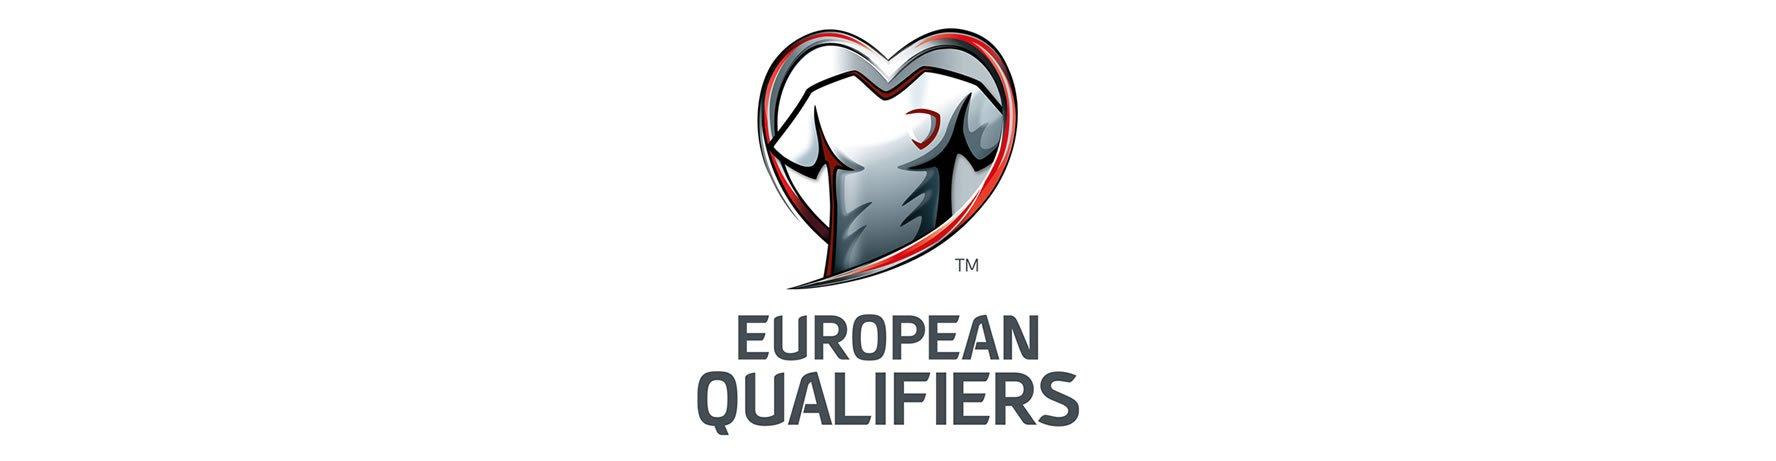 EM fodbold kvalifikationskampe